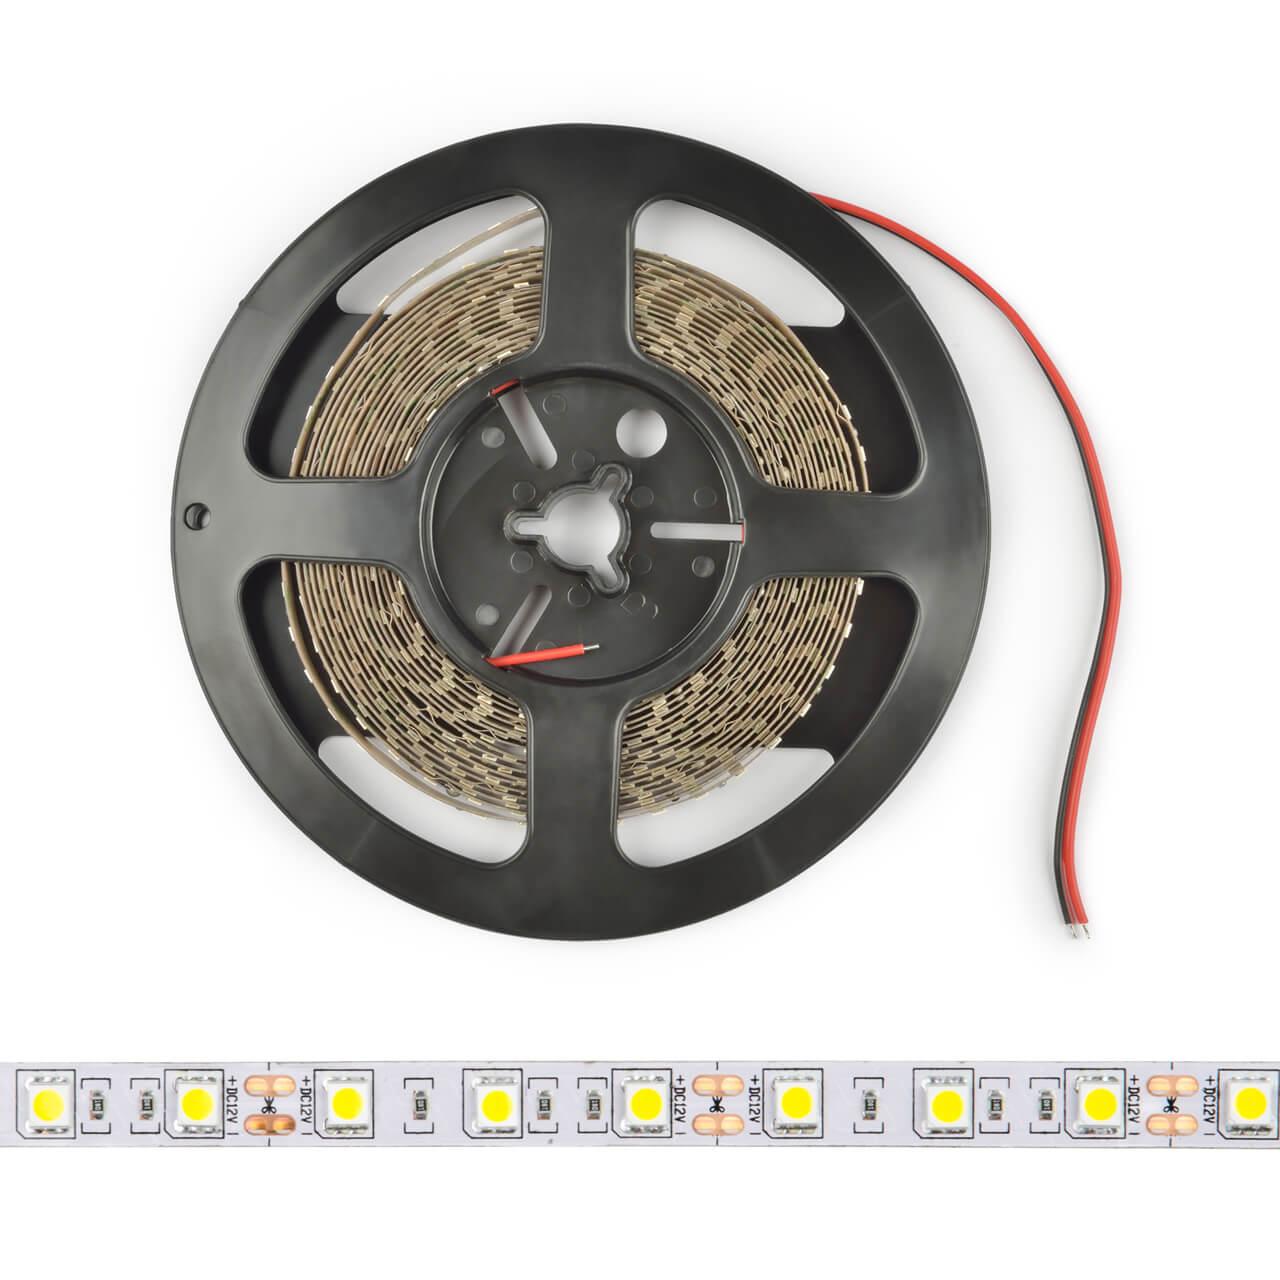 купить Светодиодная лента (UL-00004371) Uniel 7,2W/m 30LED/m 5050SMD RGB 5M ULS-M22-5050-30LED/m-10mm-IP20-DC12V-7,2W/m-5M-RGB PROFI дешево